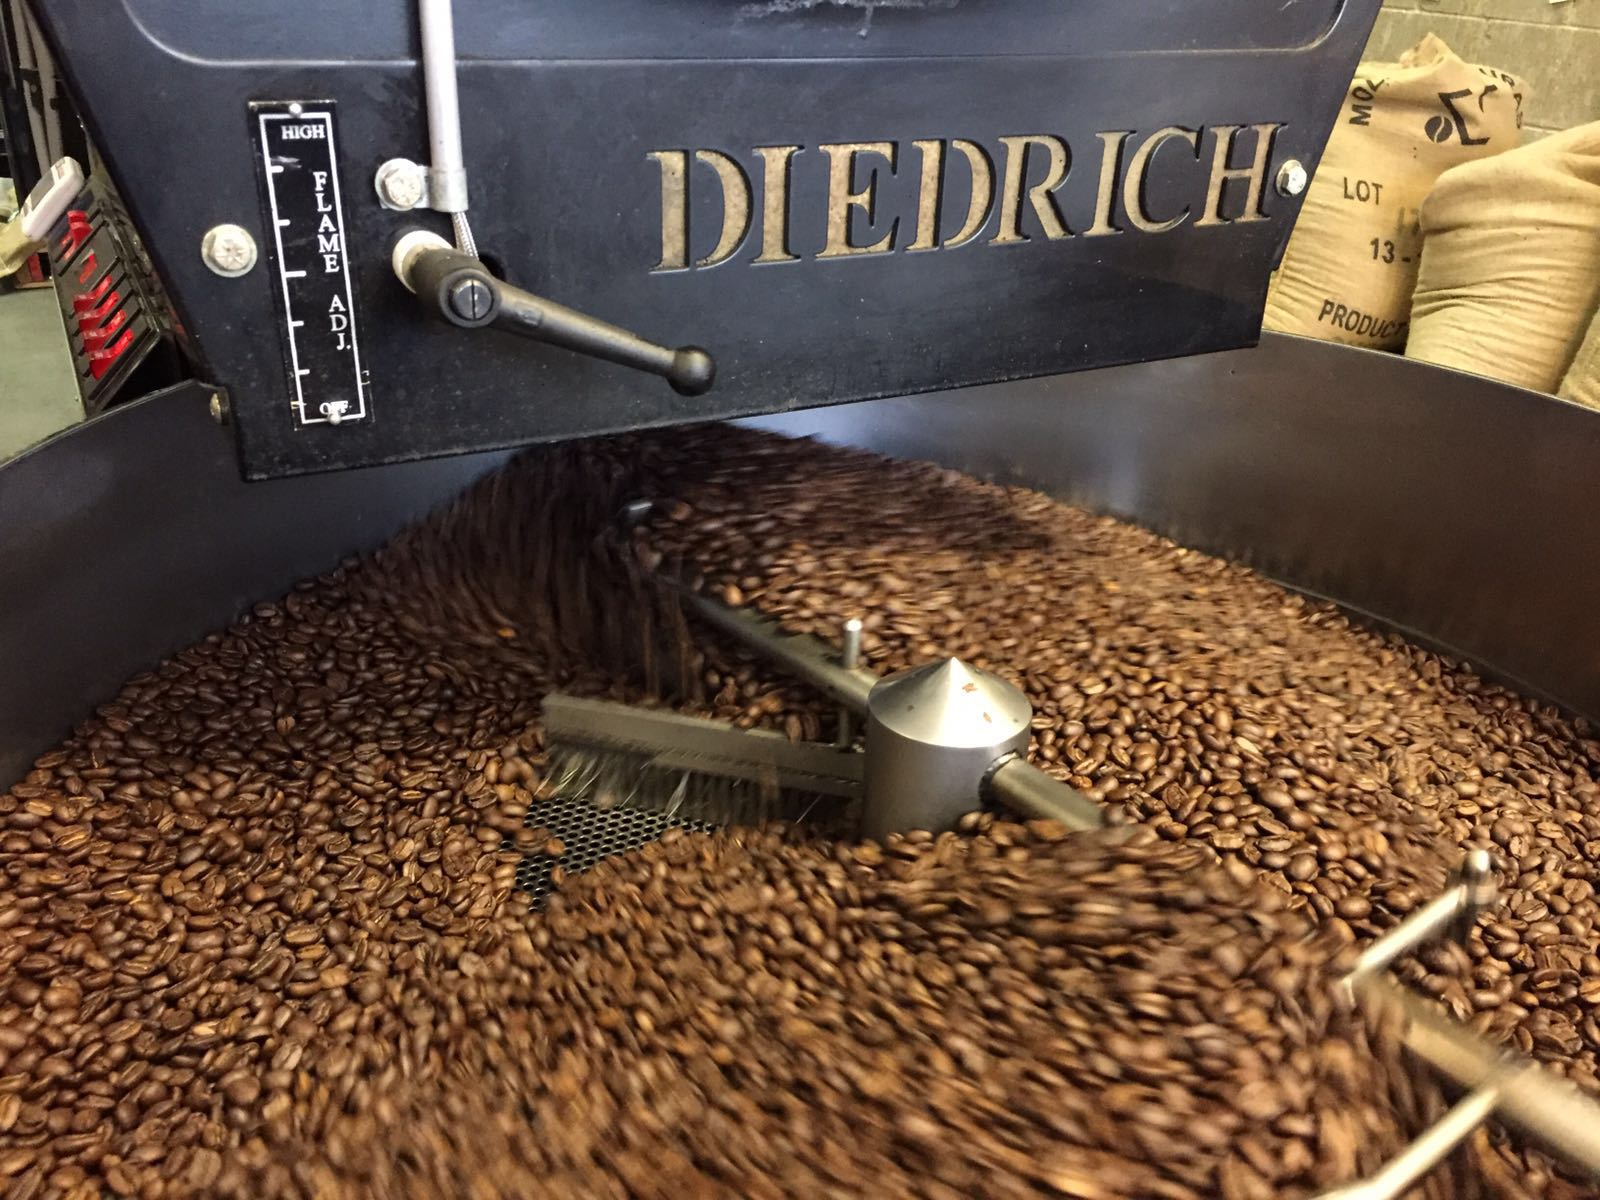 coffeeroaster.JPG